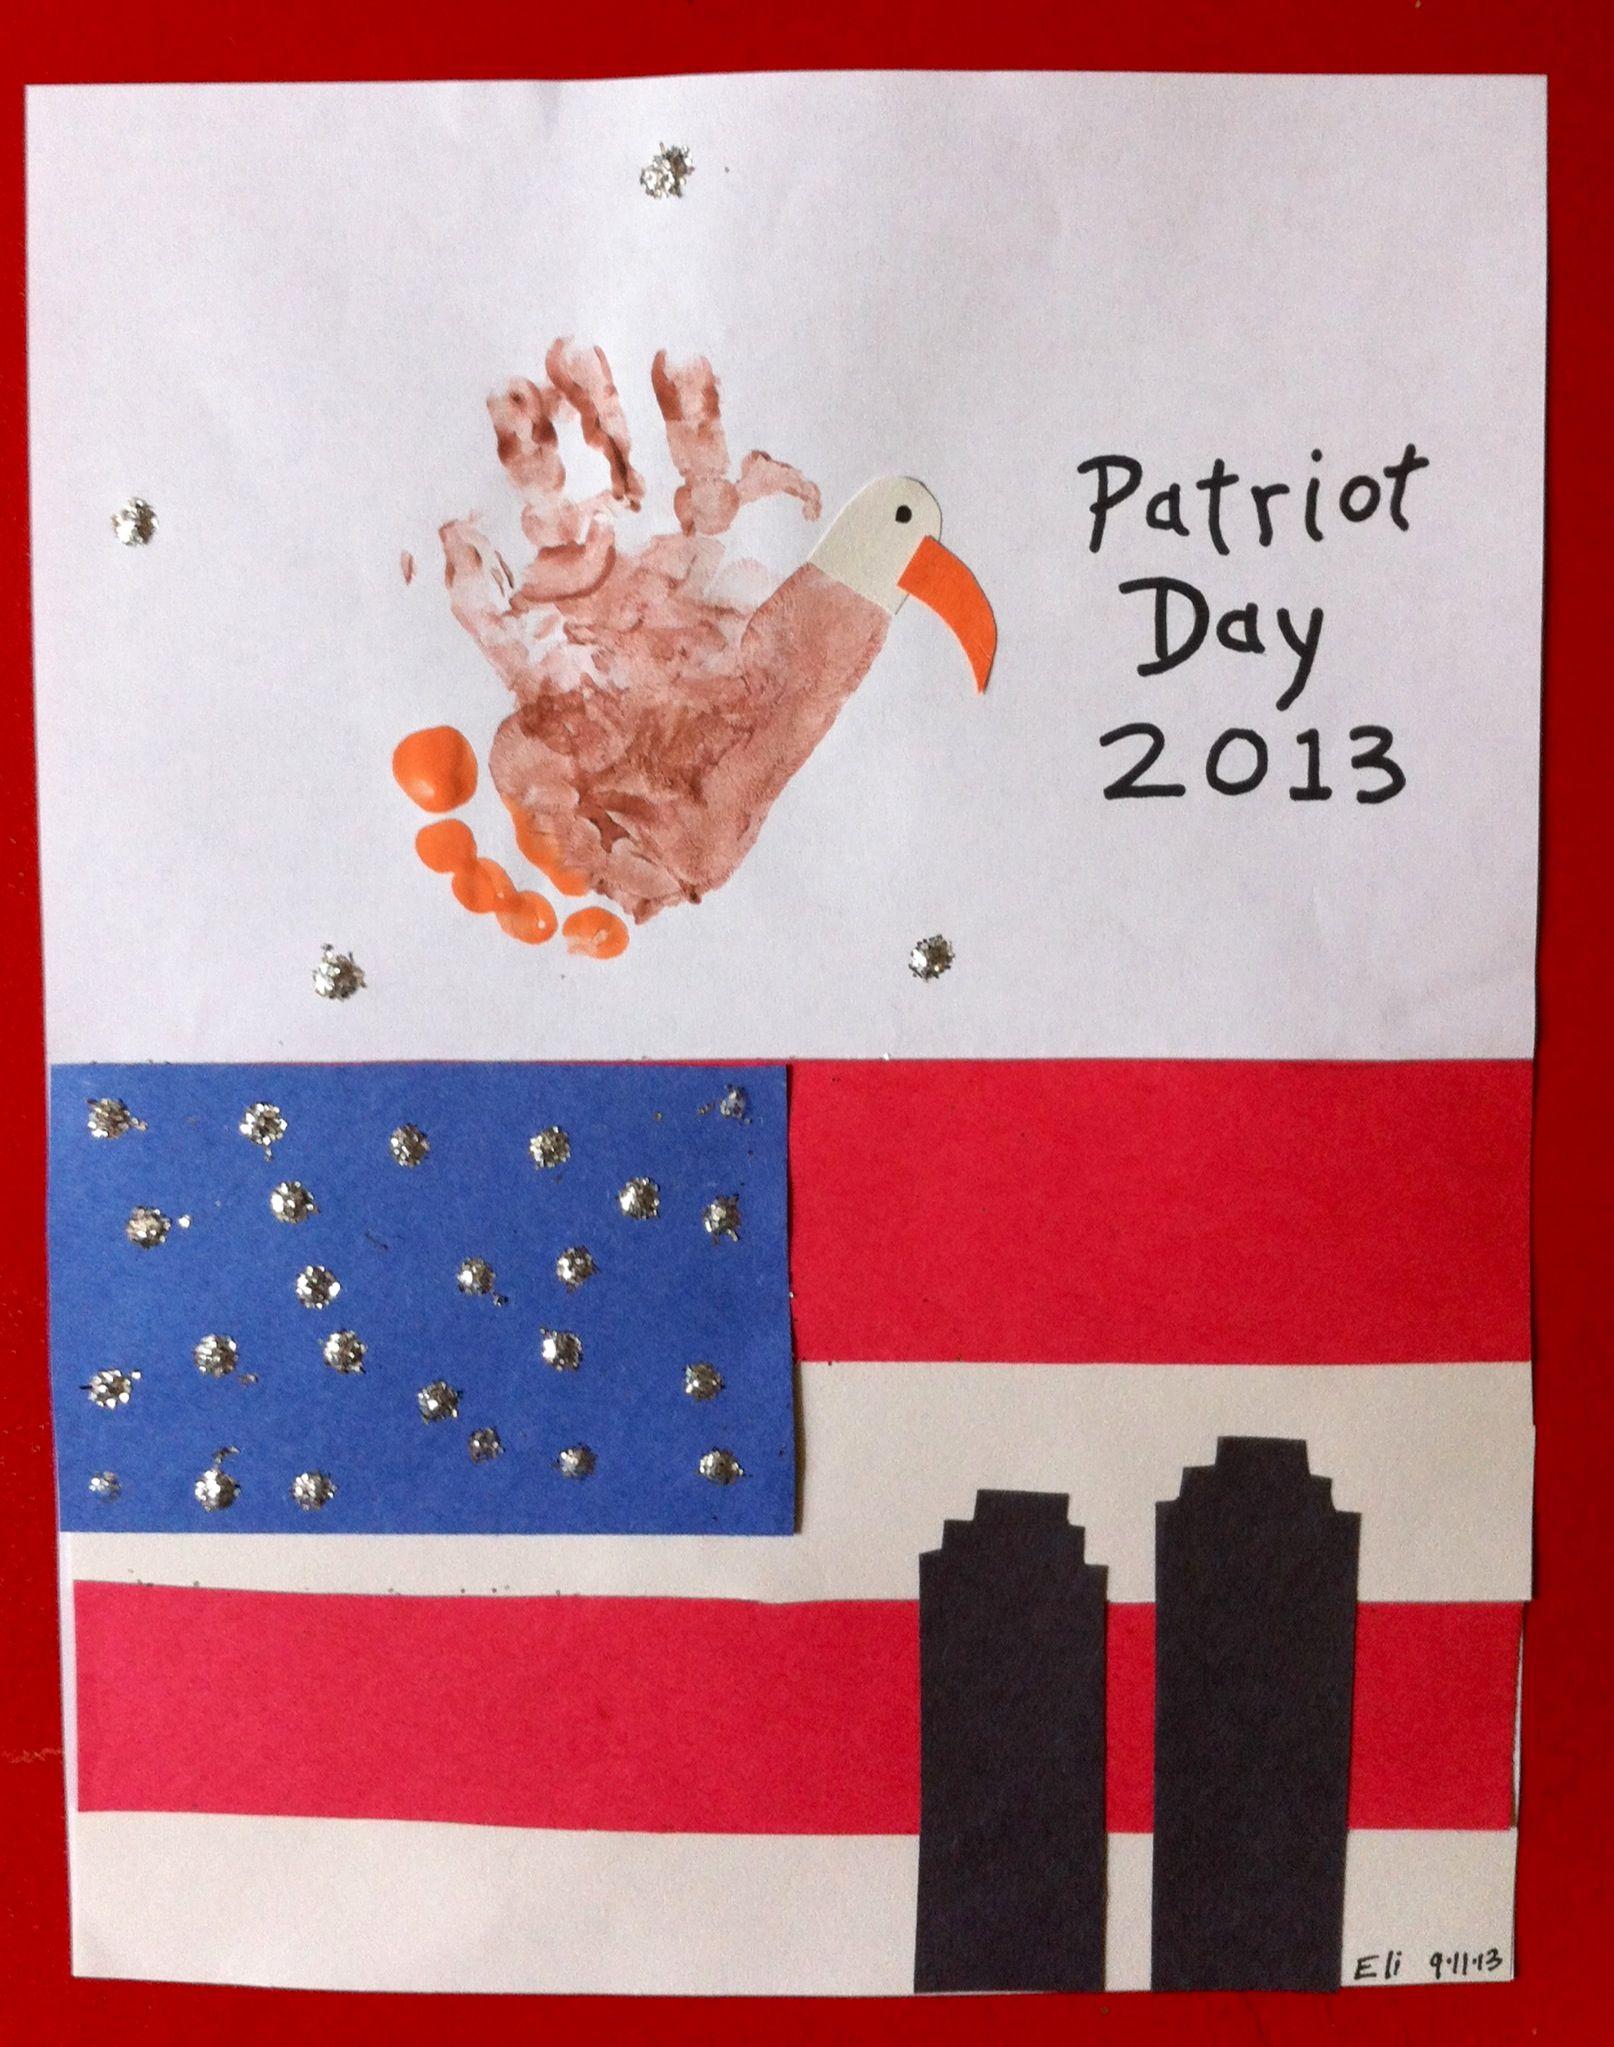 Patriot Day Footprint Amp Handprint Craft Patriotday 9 11